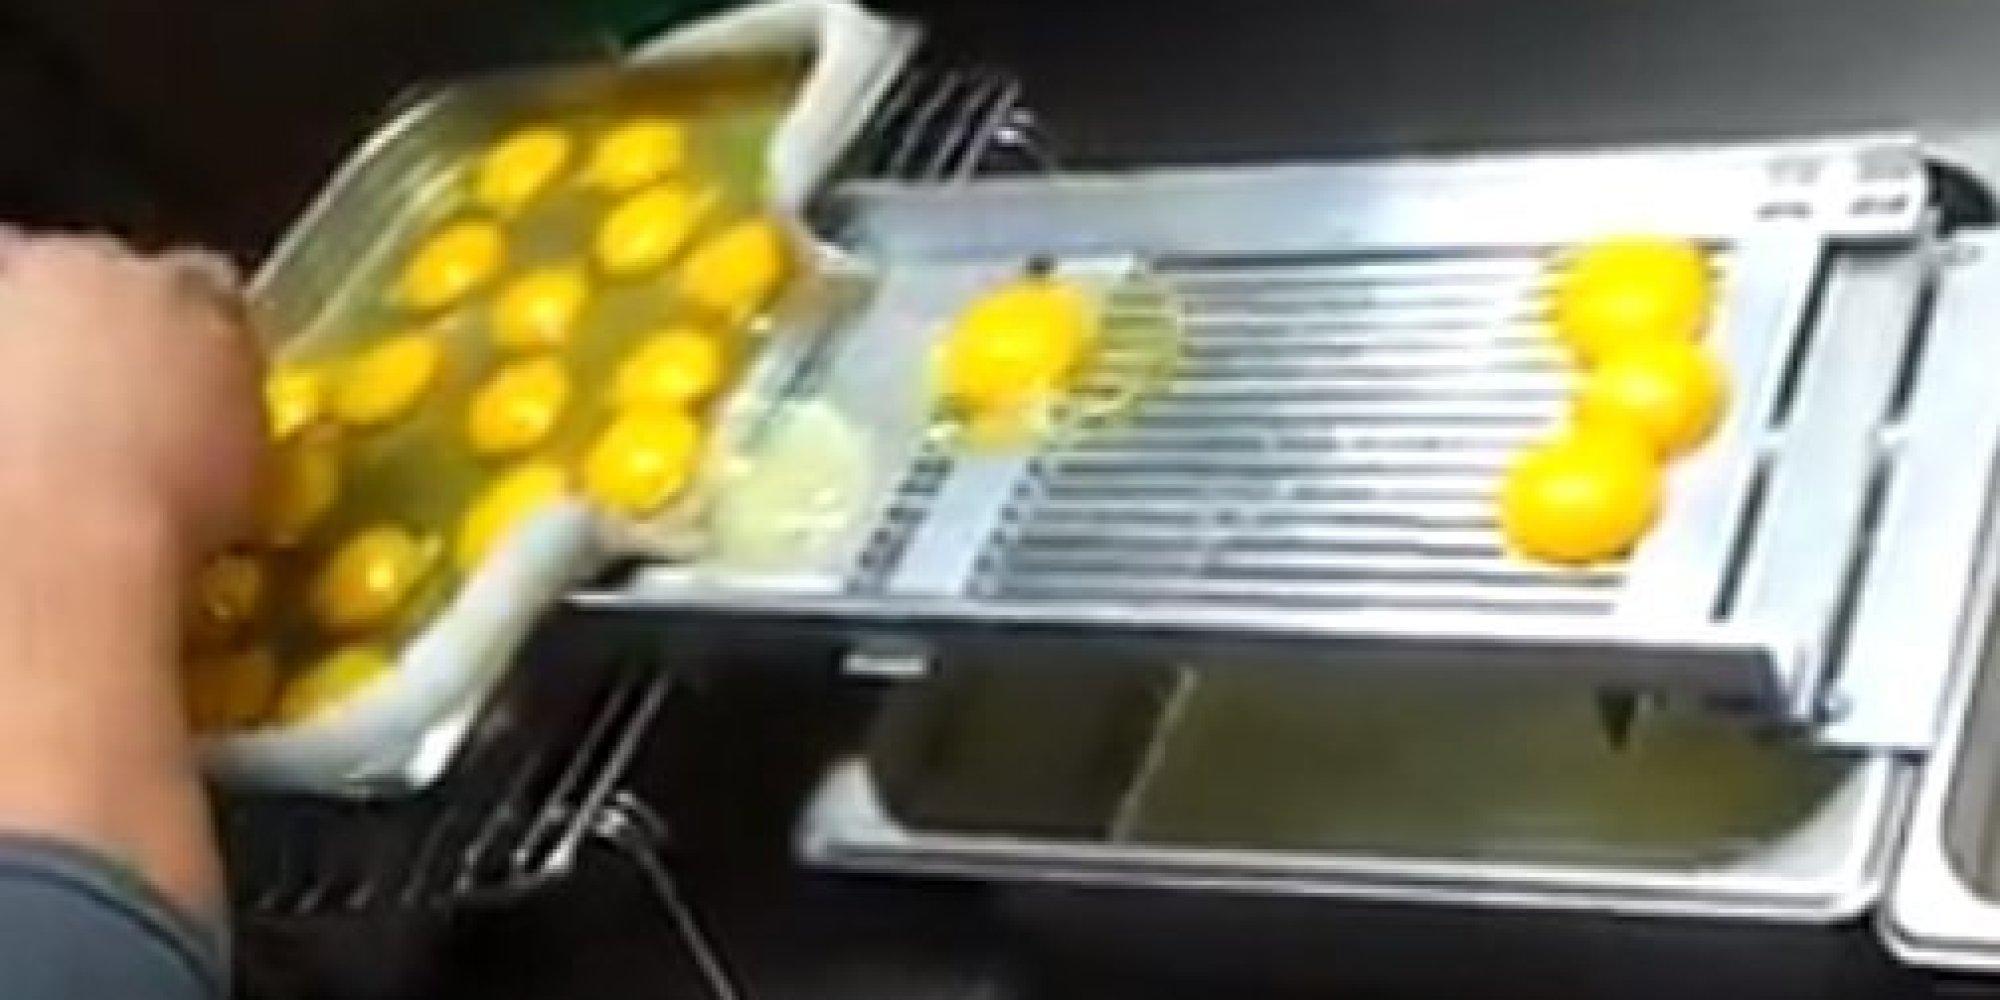 yolk separator machine